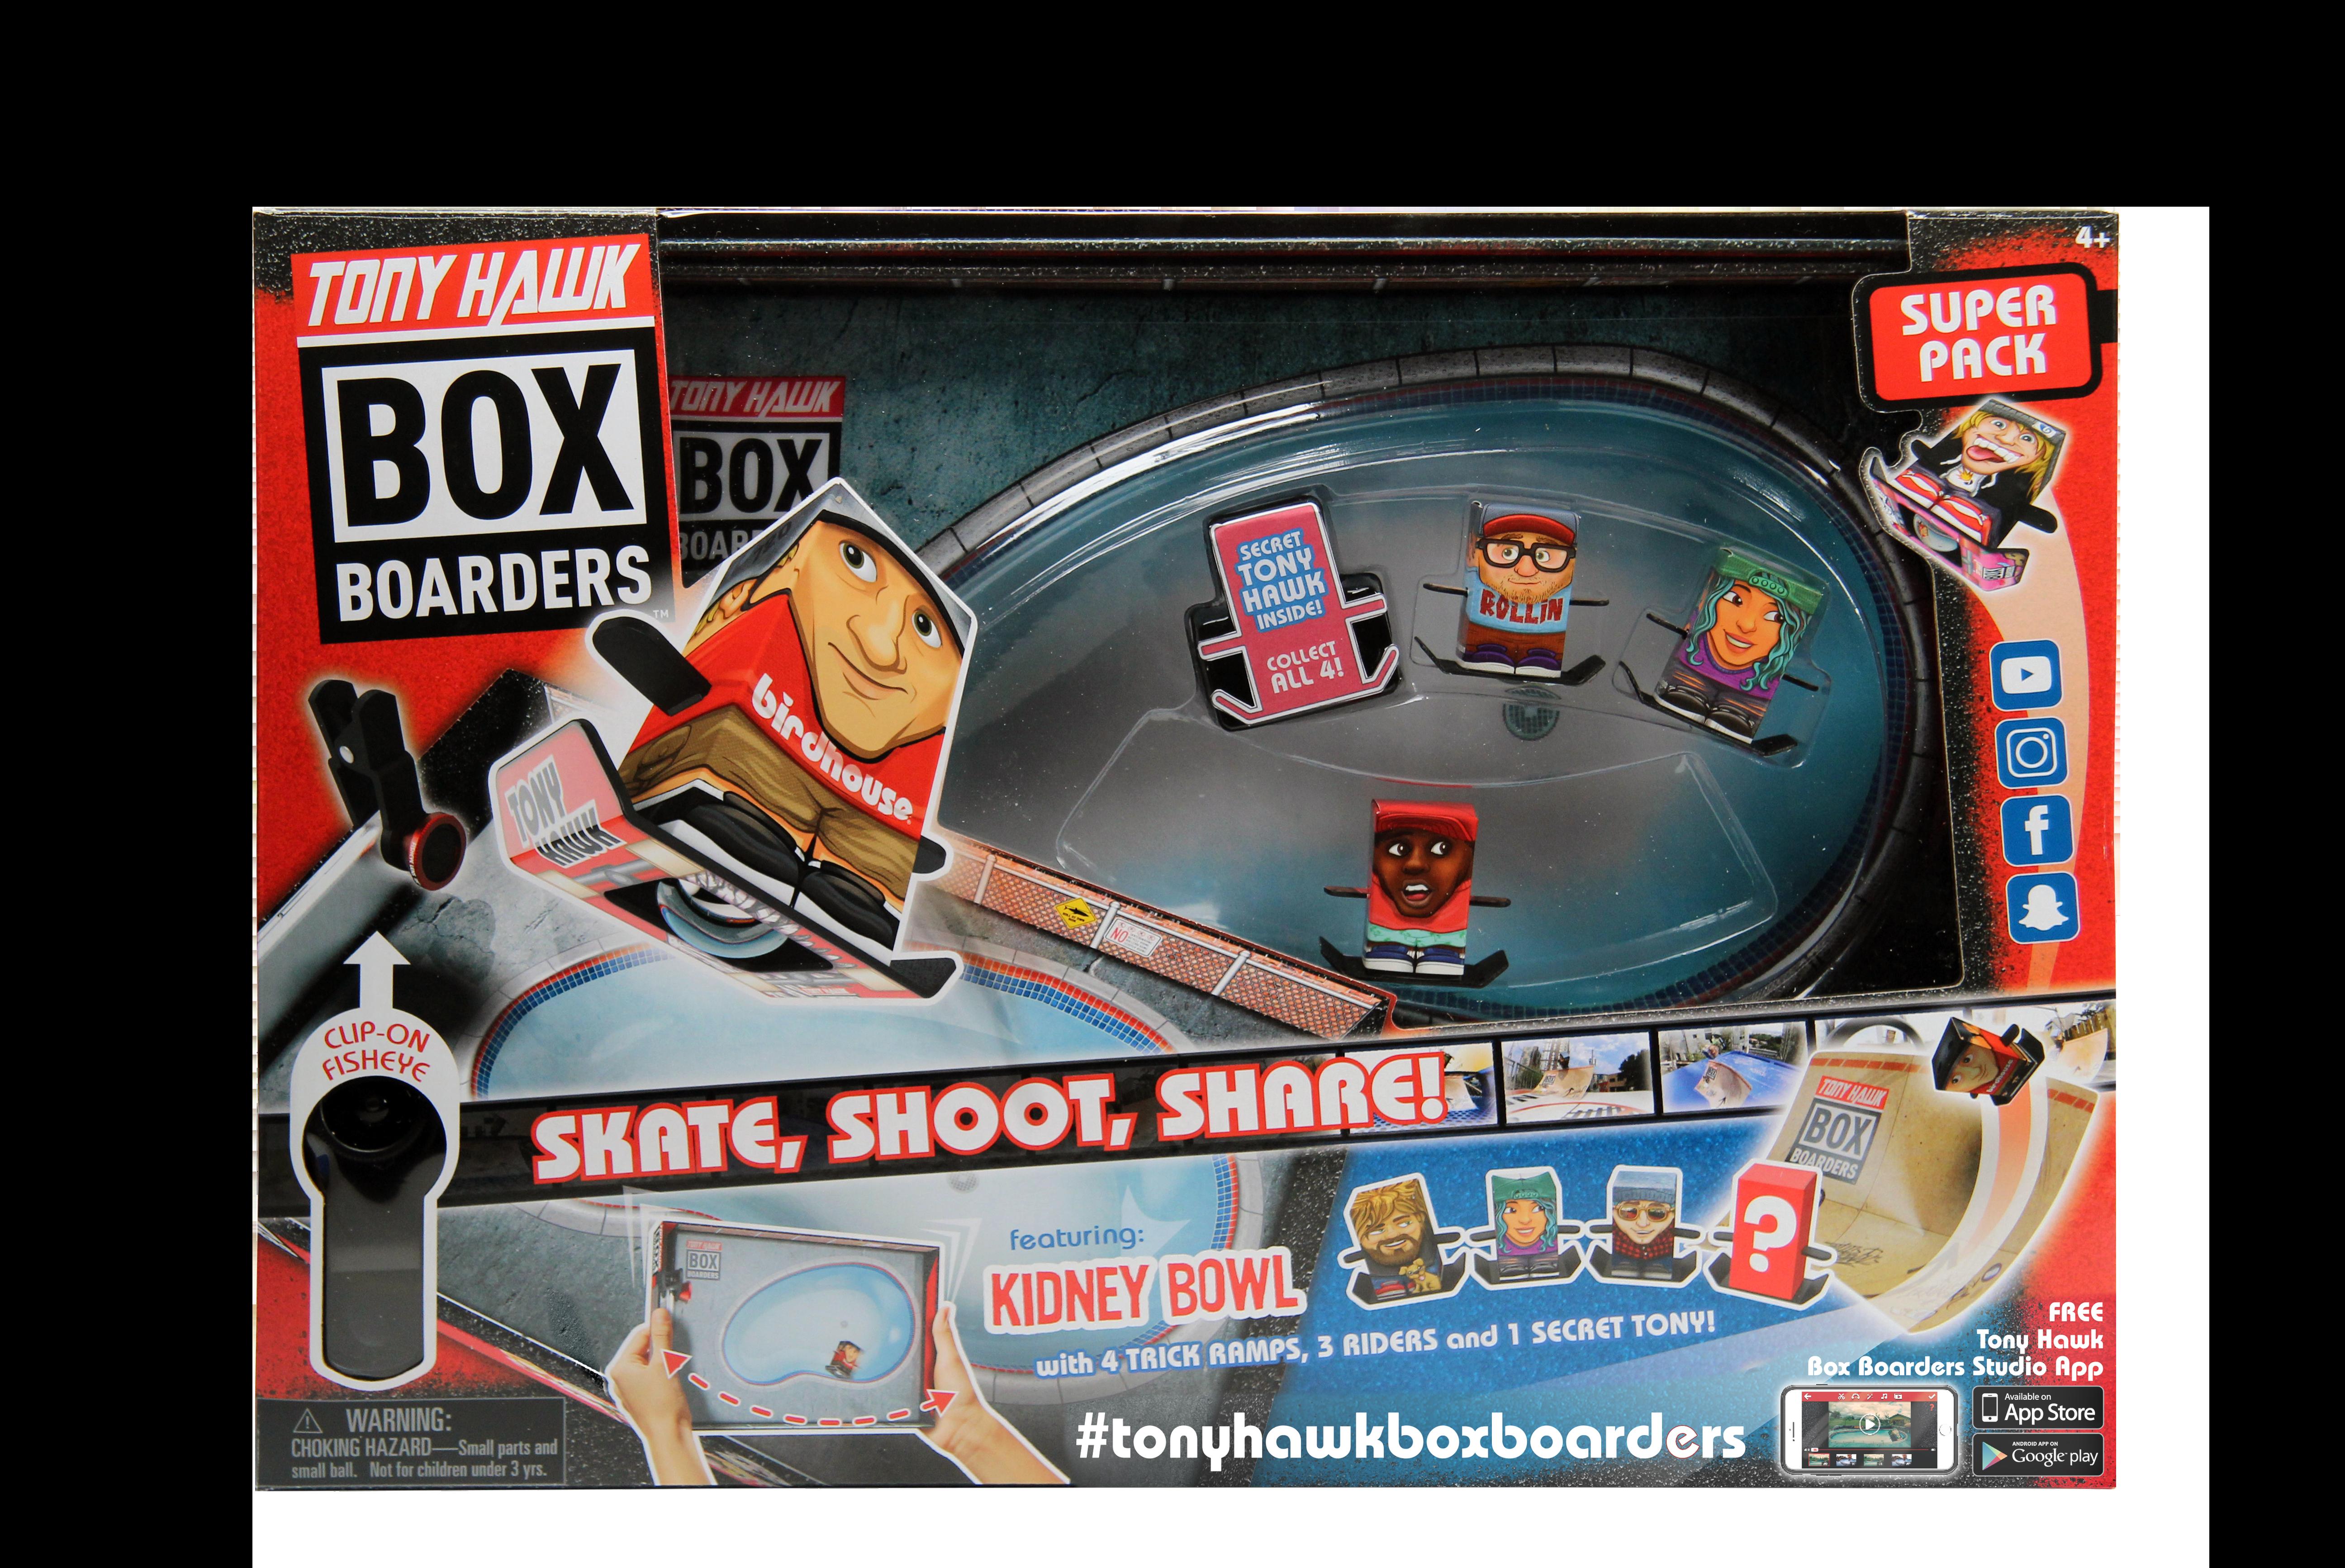 Tony Hawk Box Boarders Super Pack